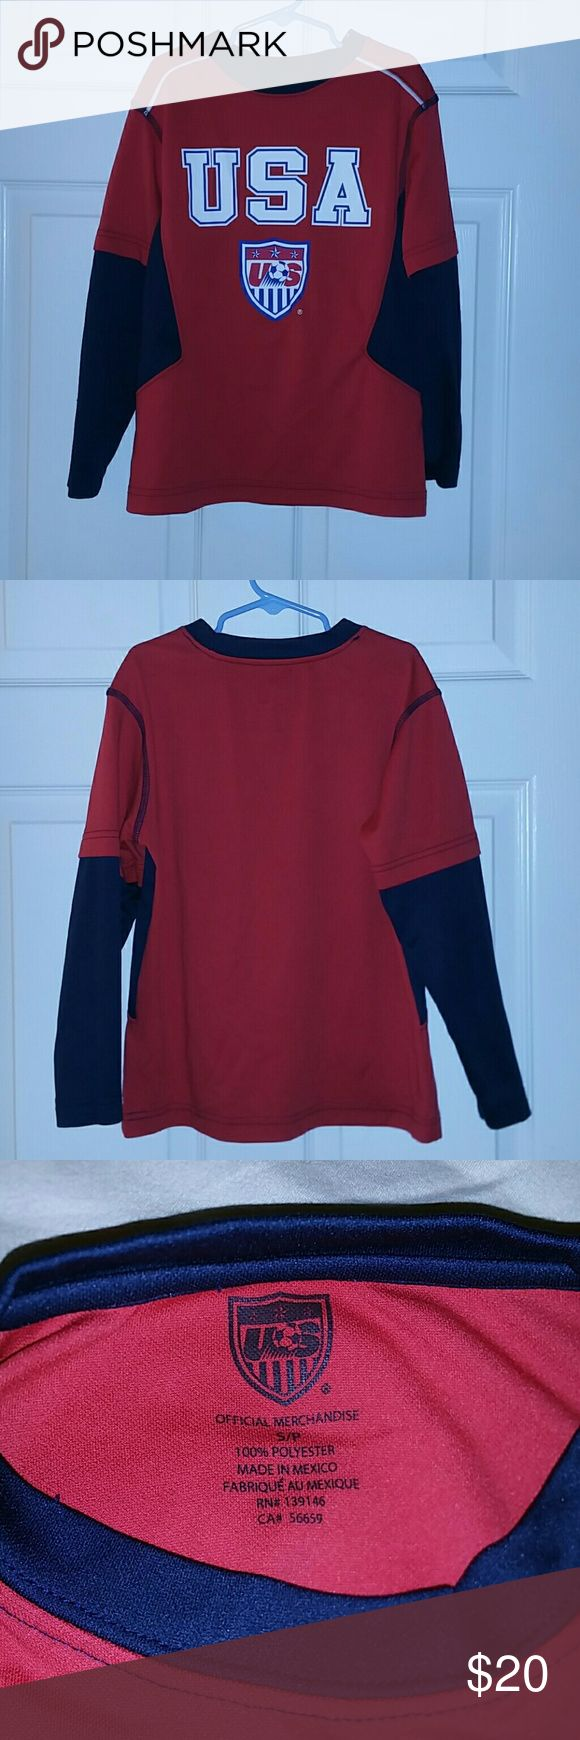 Boys long sleeve soccer shirt Boys long sleeve USA soccer shirt USA official Mechandise Shirts & Tops Tees - Long Sleeve